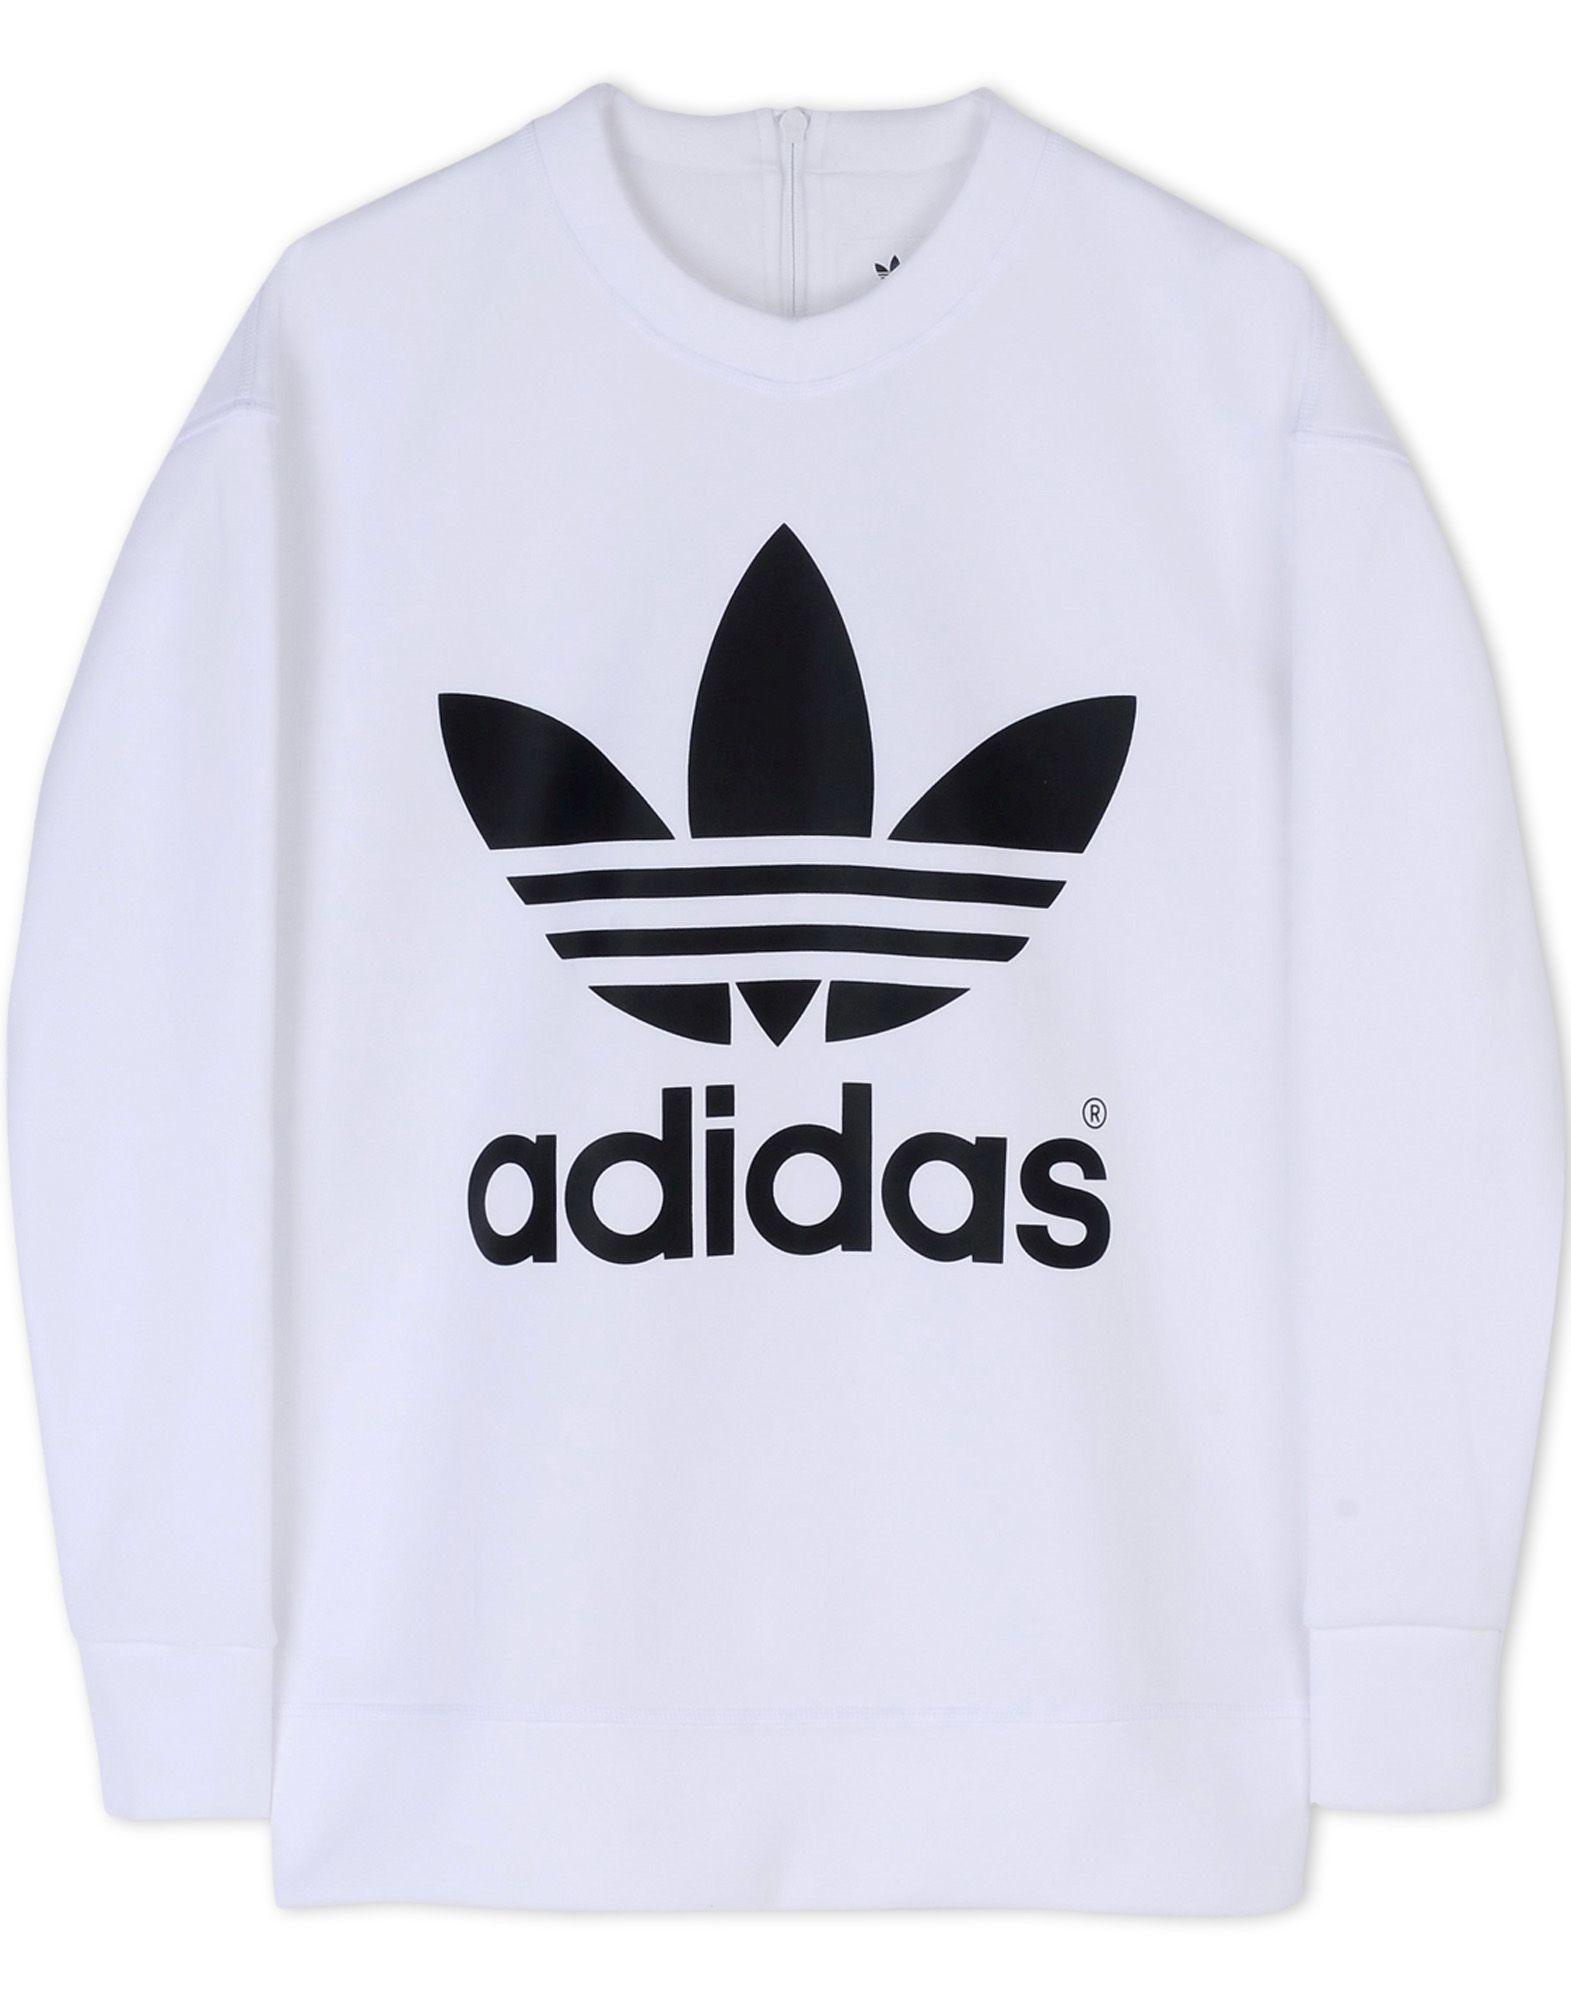 white adidas sweater - Membrane Switch Technologies fa4a8b4dfe